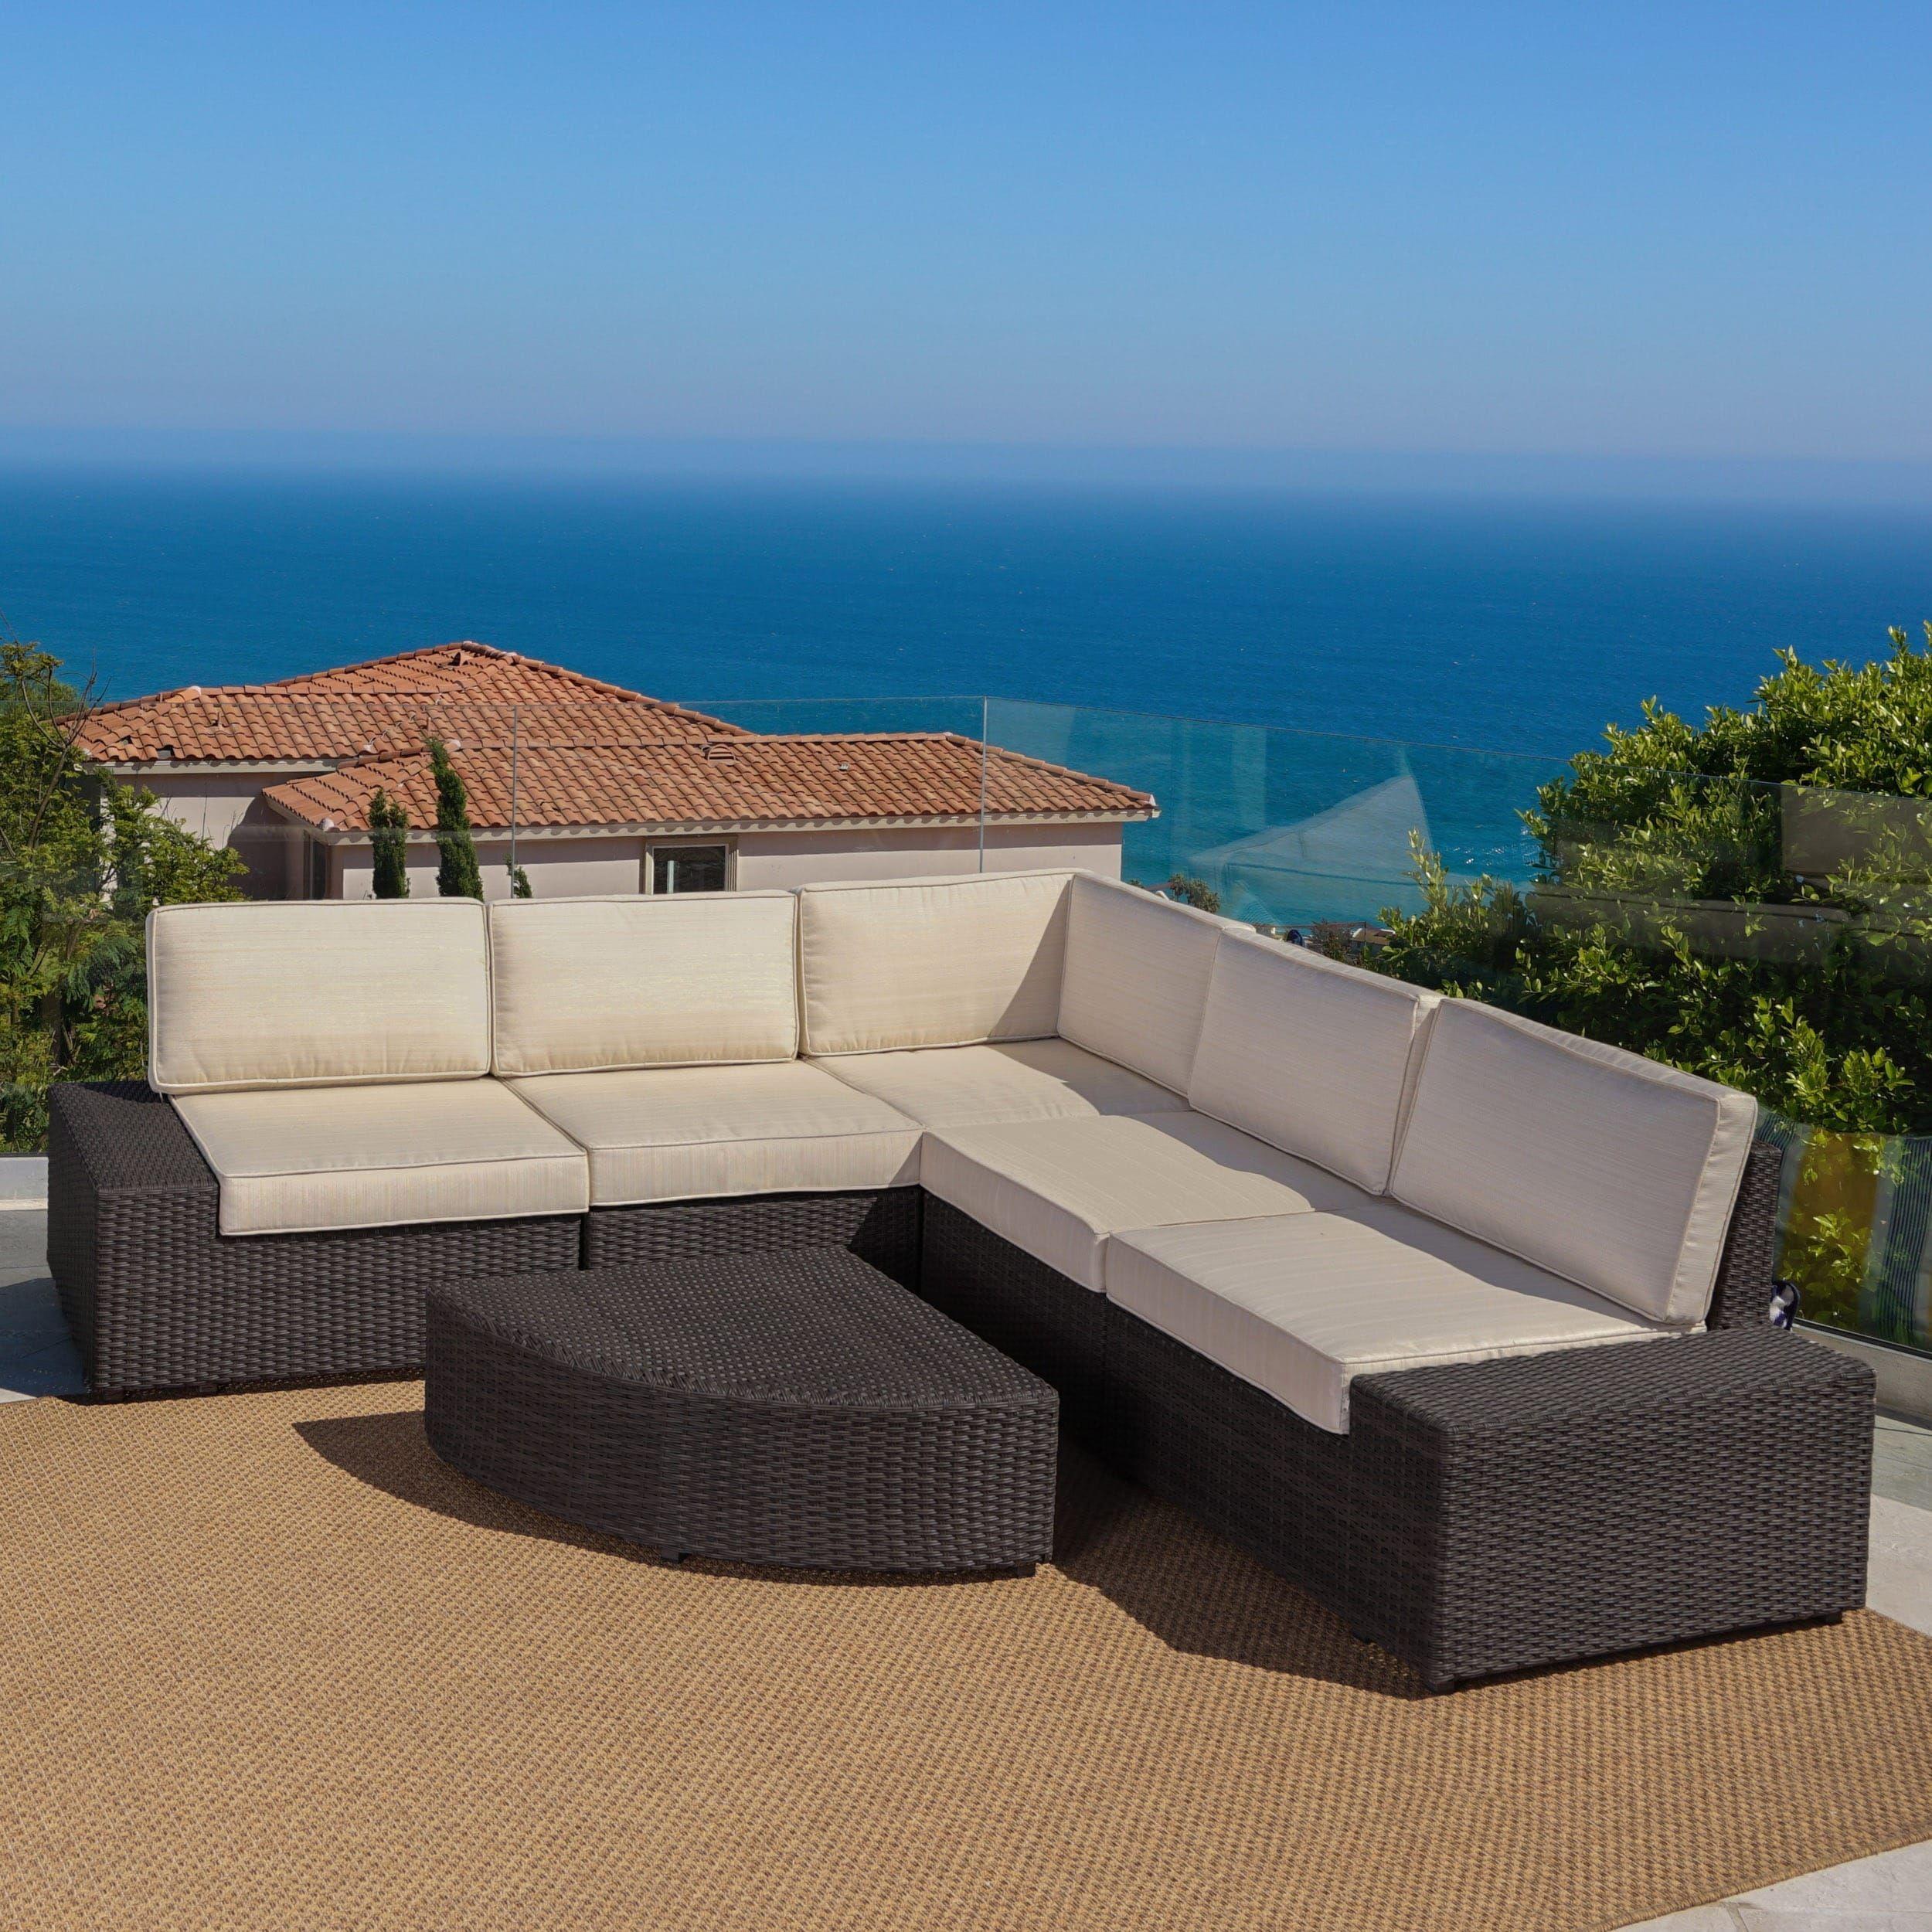 Online Ping Bedding Furniture Electronics Jewelry Clothing More Santa Cruz Outdoor